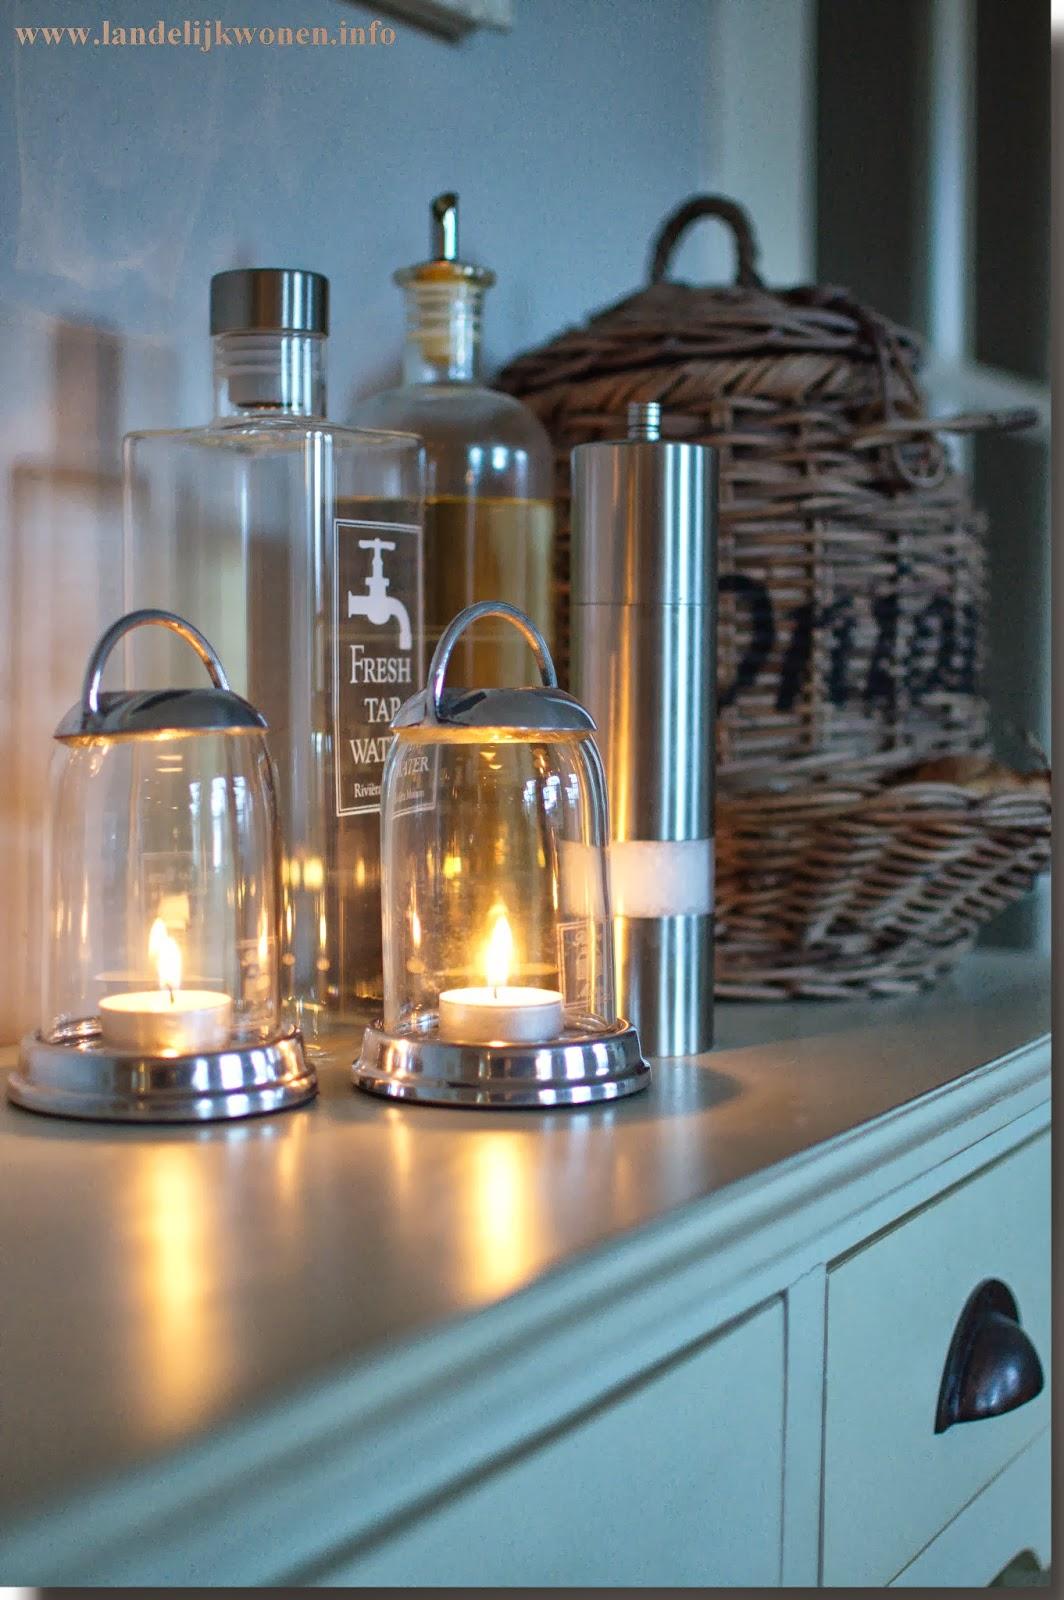 Riviera maison woonkamer ideeen ~ artikill.com